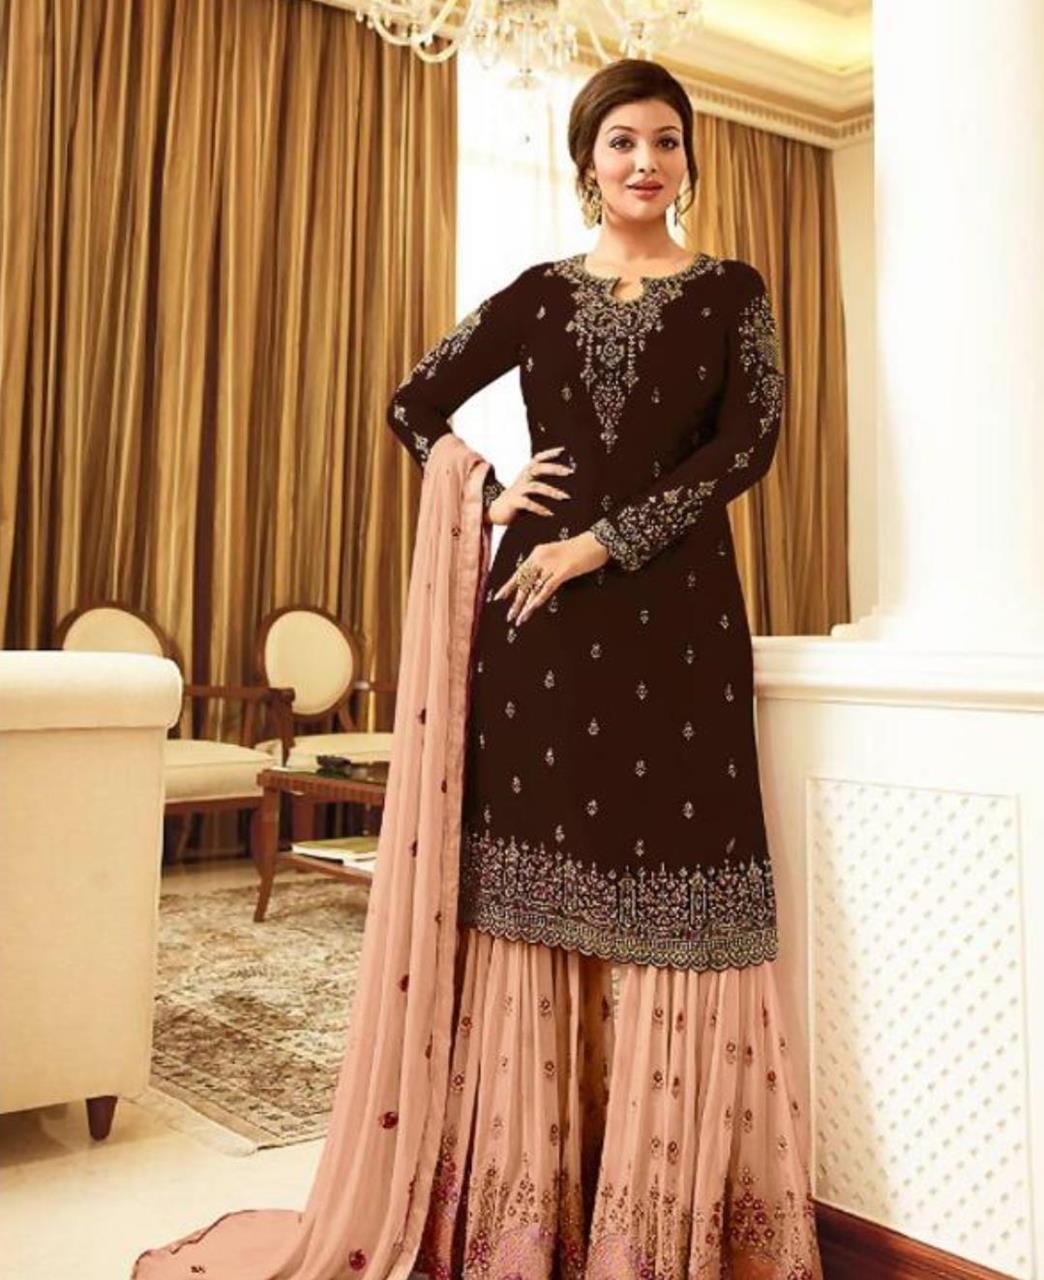 Embroidered Georgette Straight cut Salwar Kameez in Dark Brown